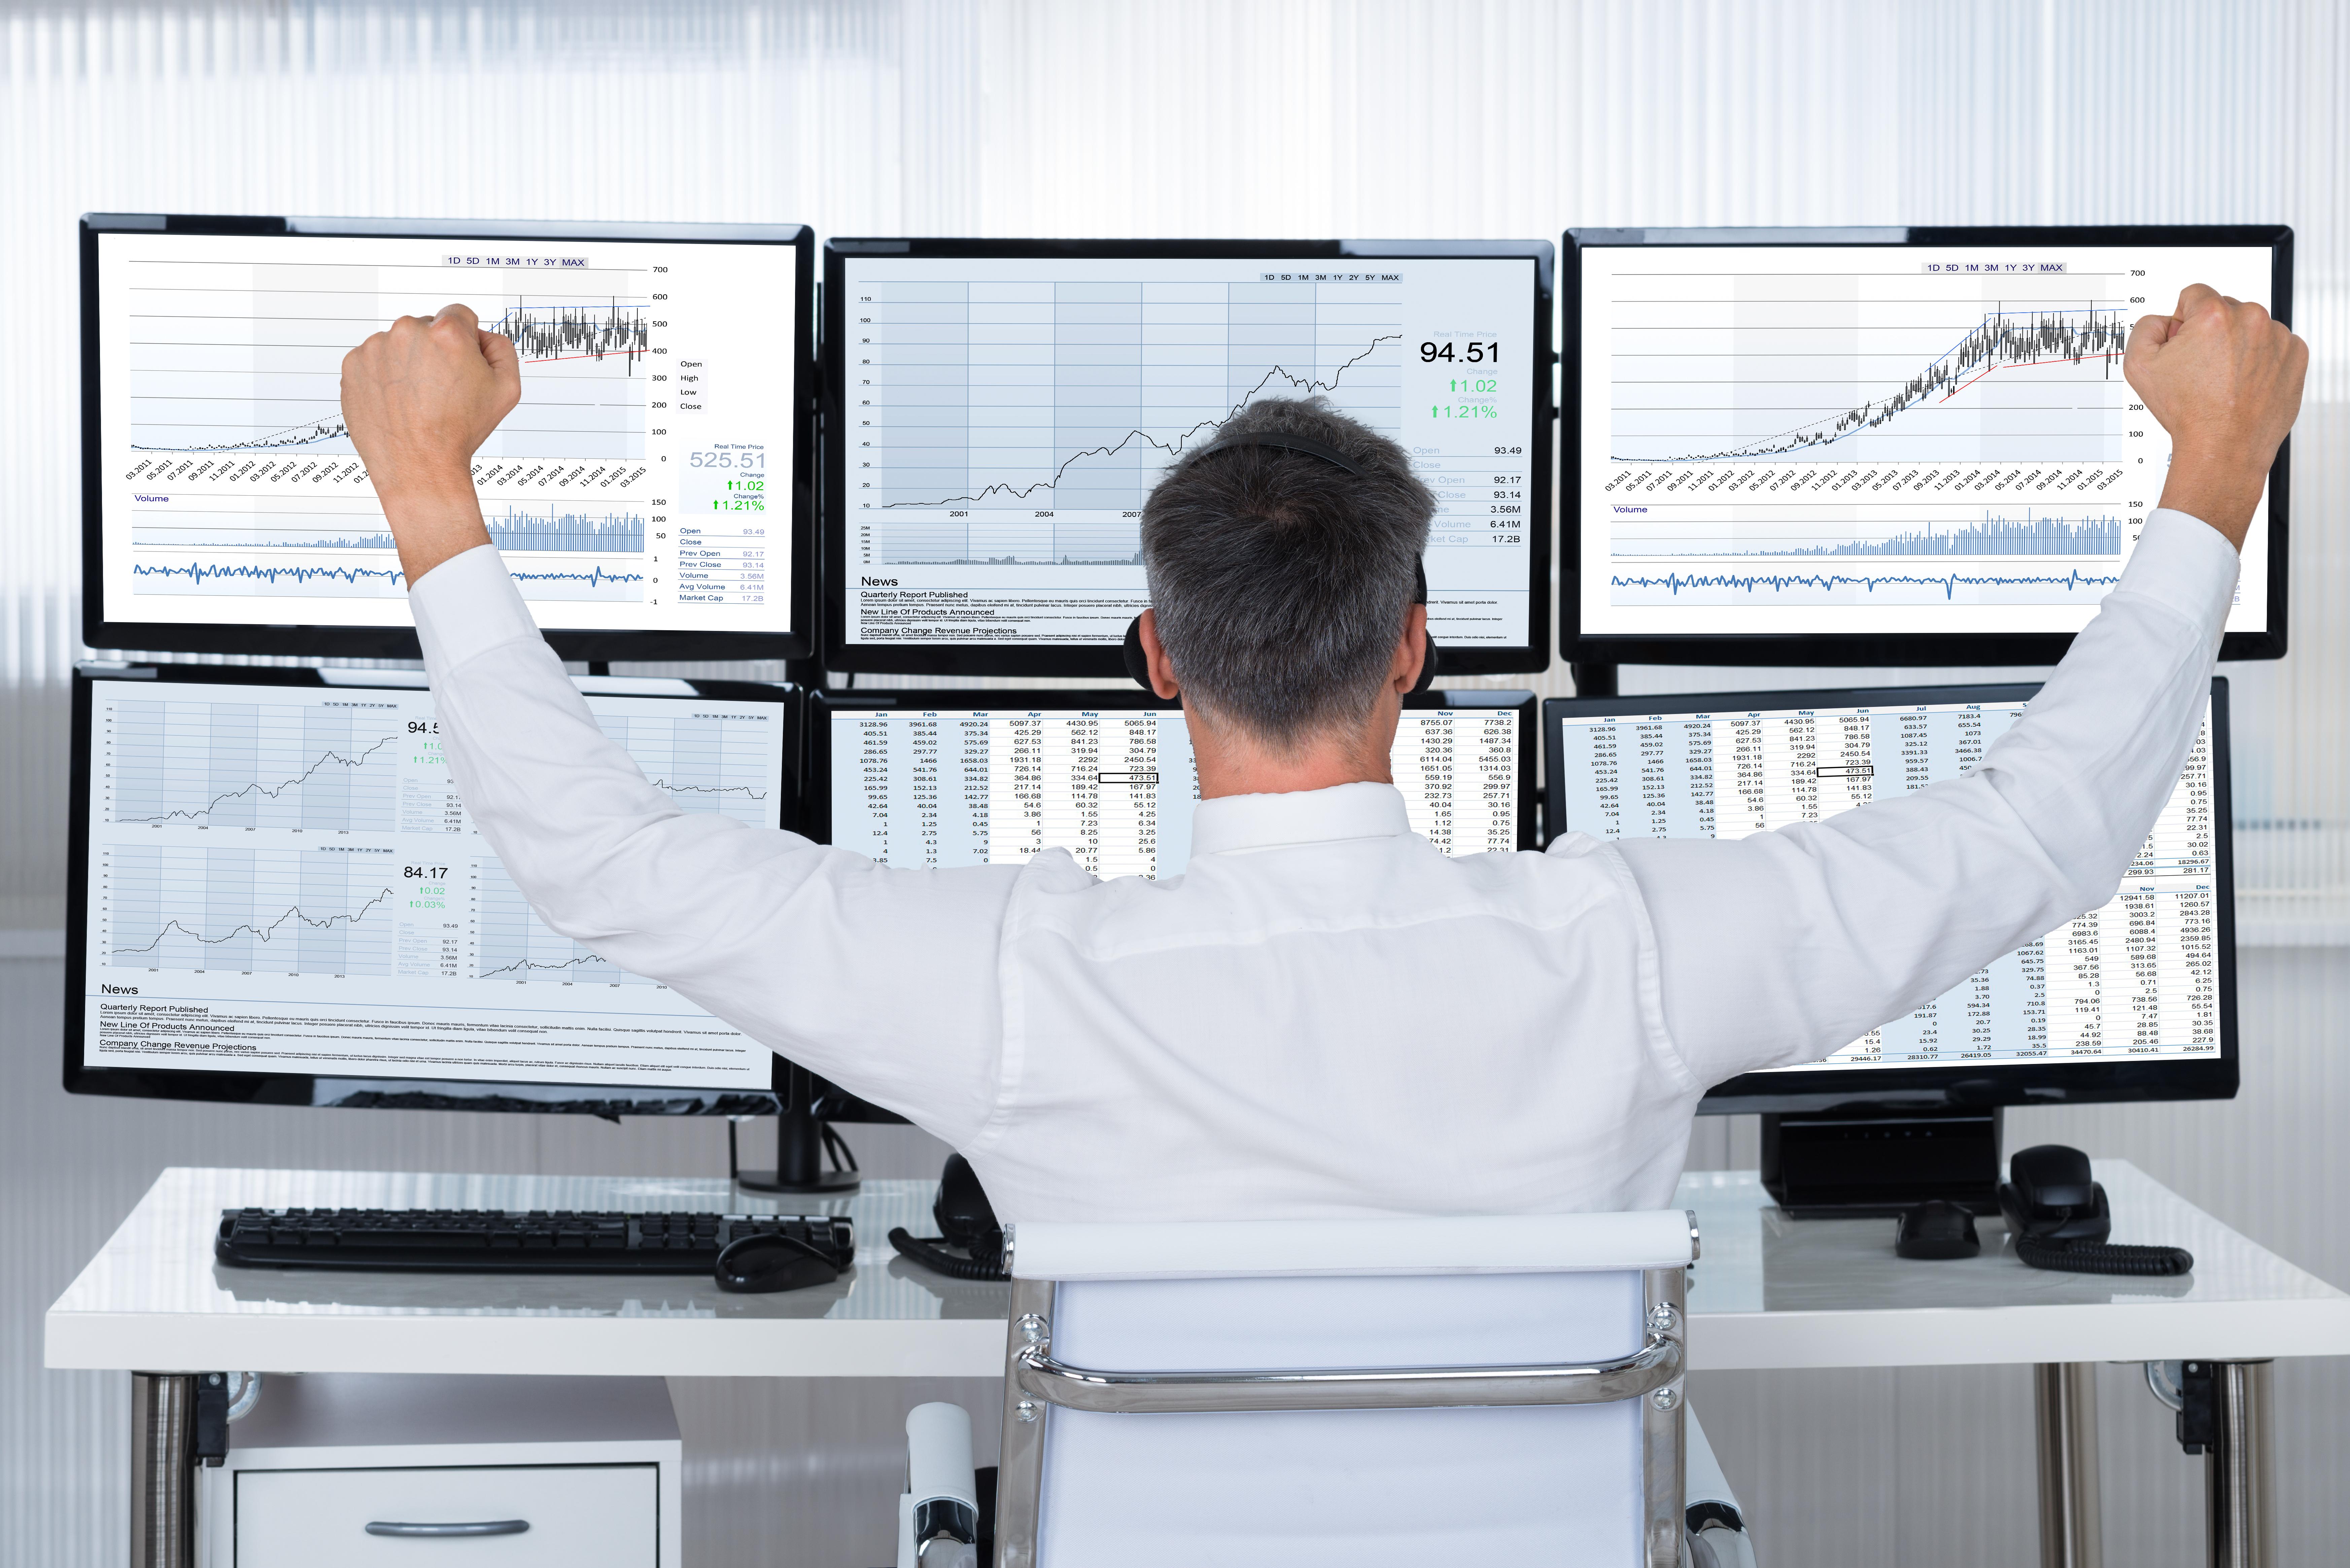 Exhilarated investor